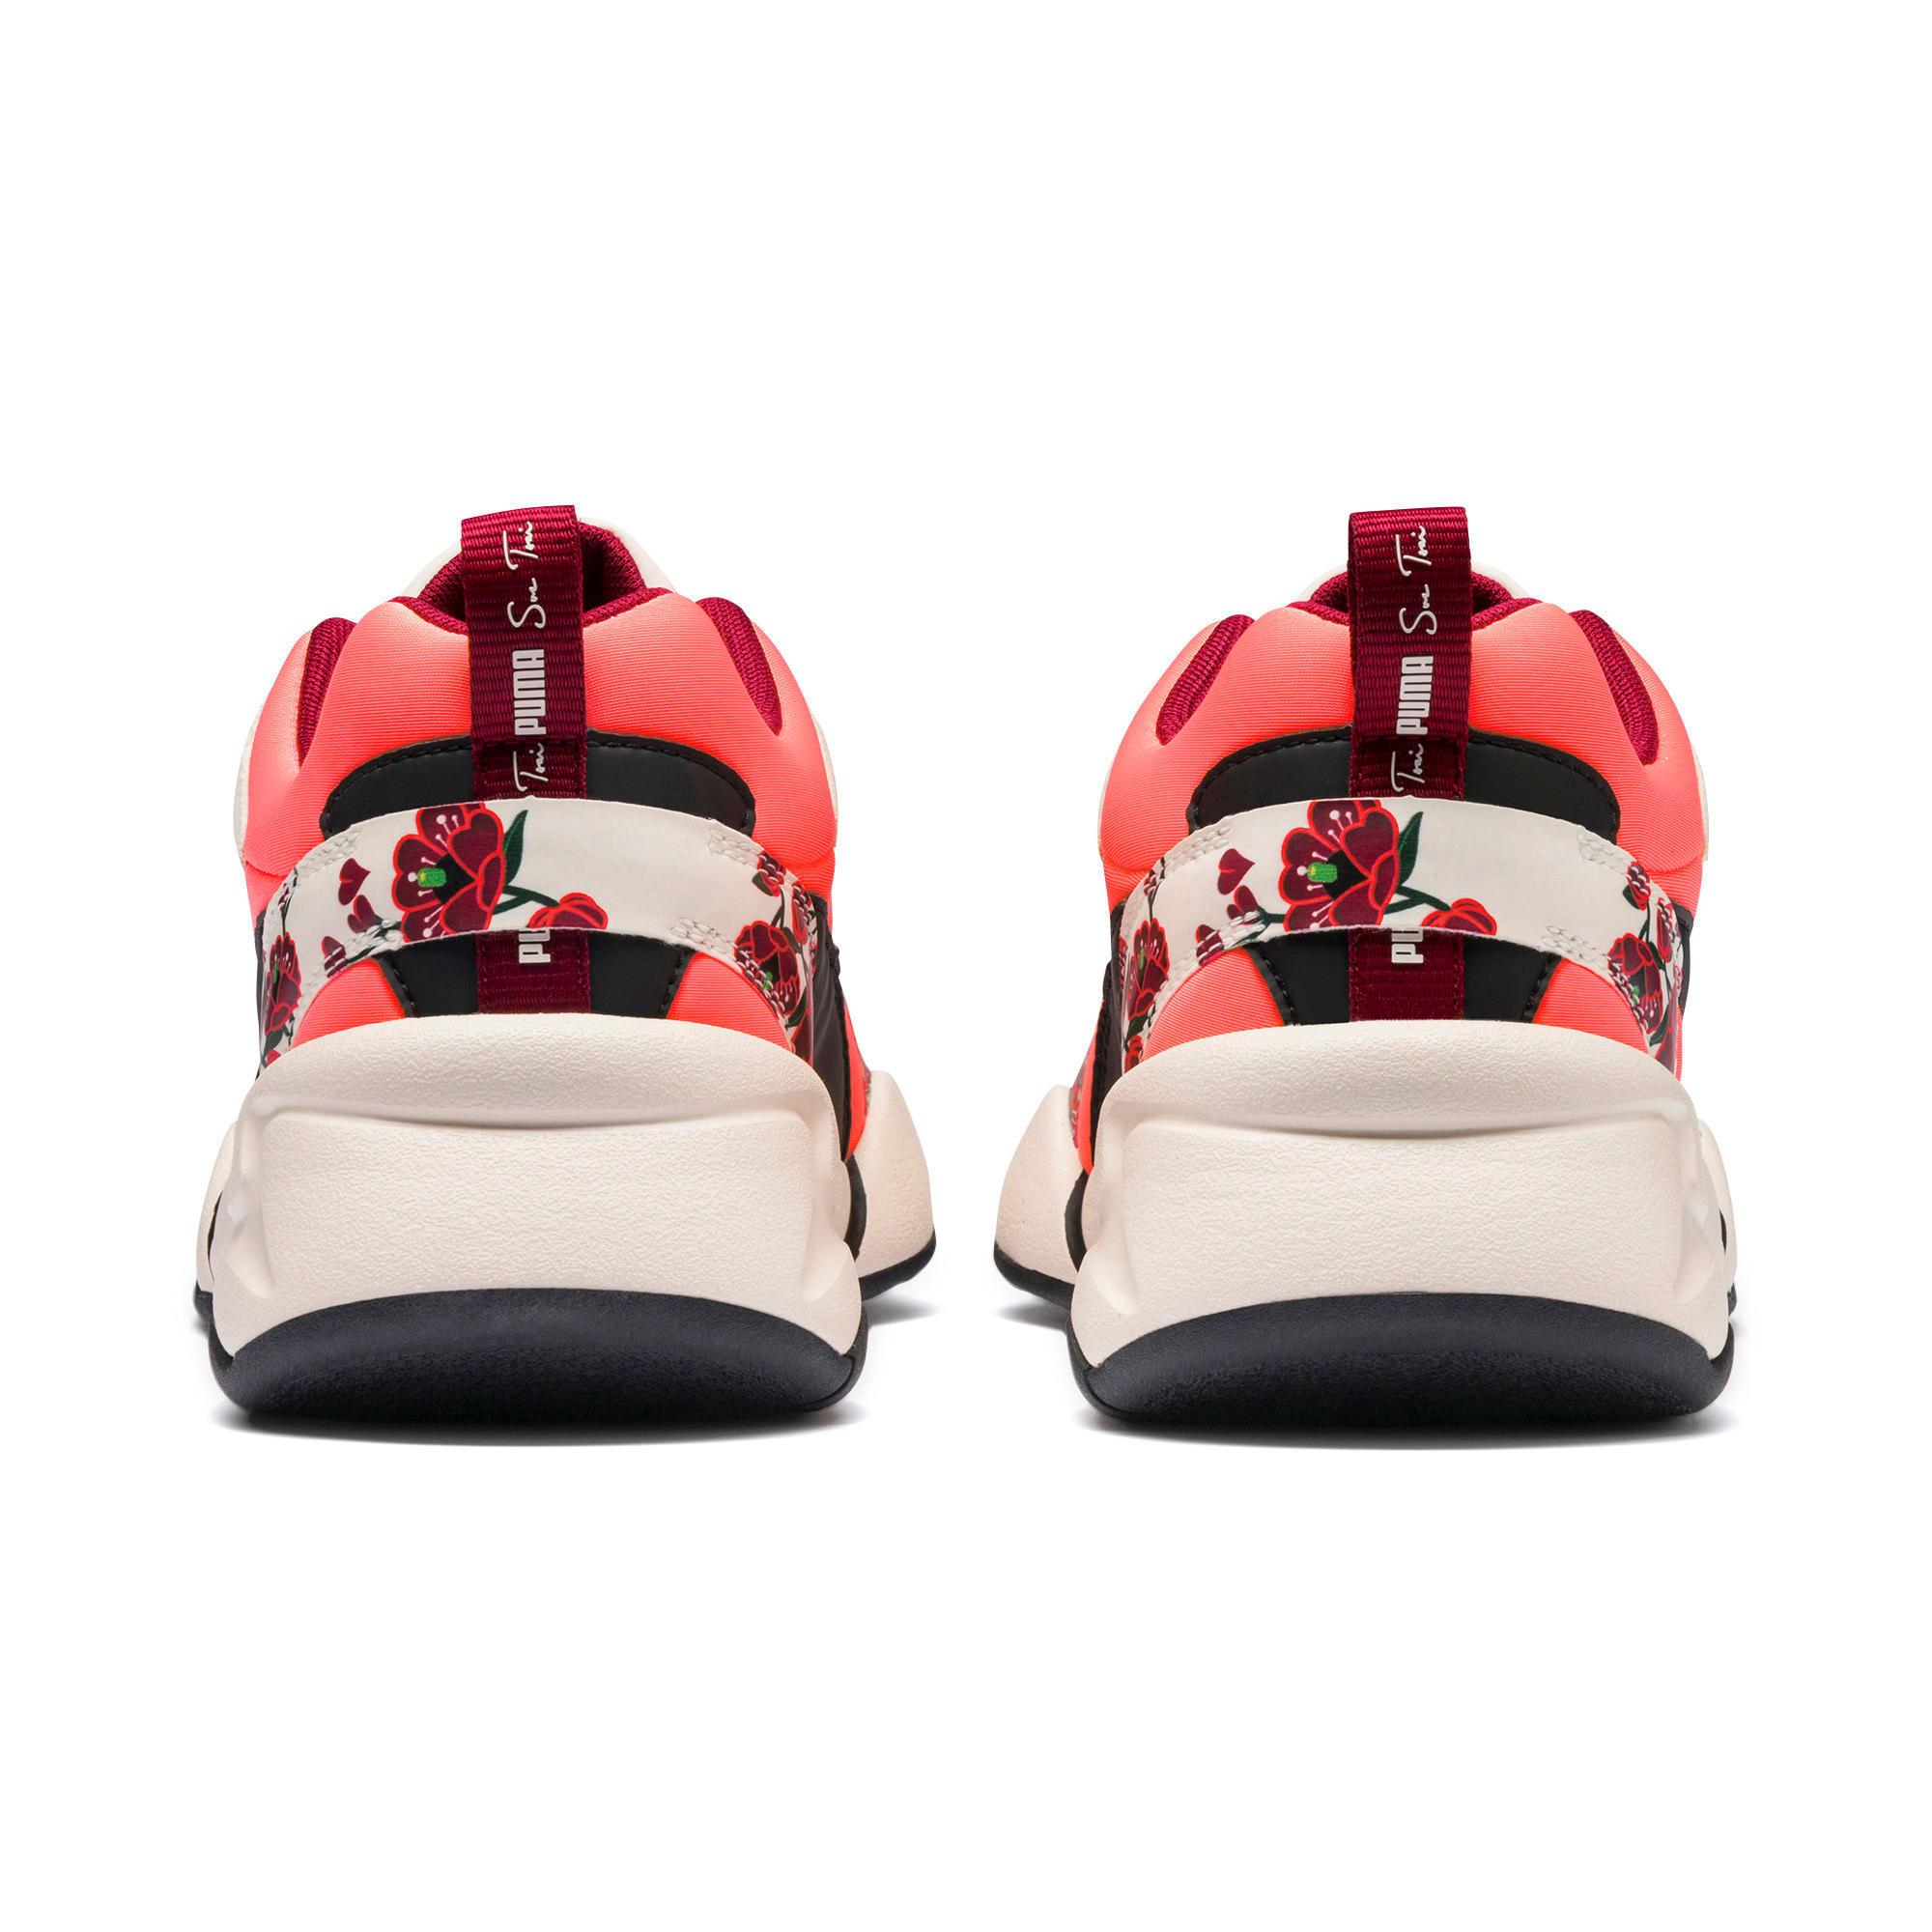 Thumbnail 4 of PUMA x SUE TSAI Nova Cherry Bombs Women's Sneakers, Powder Puff-Puma Black, medium